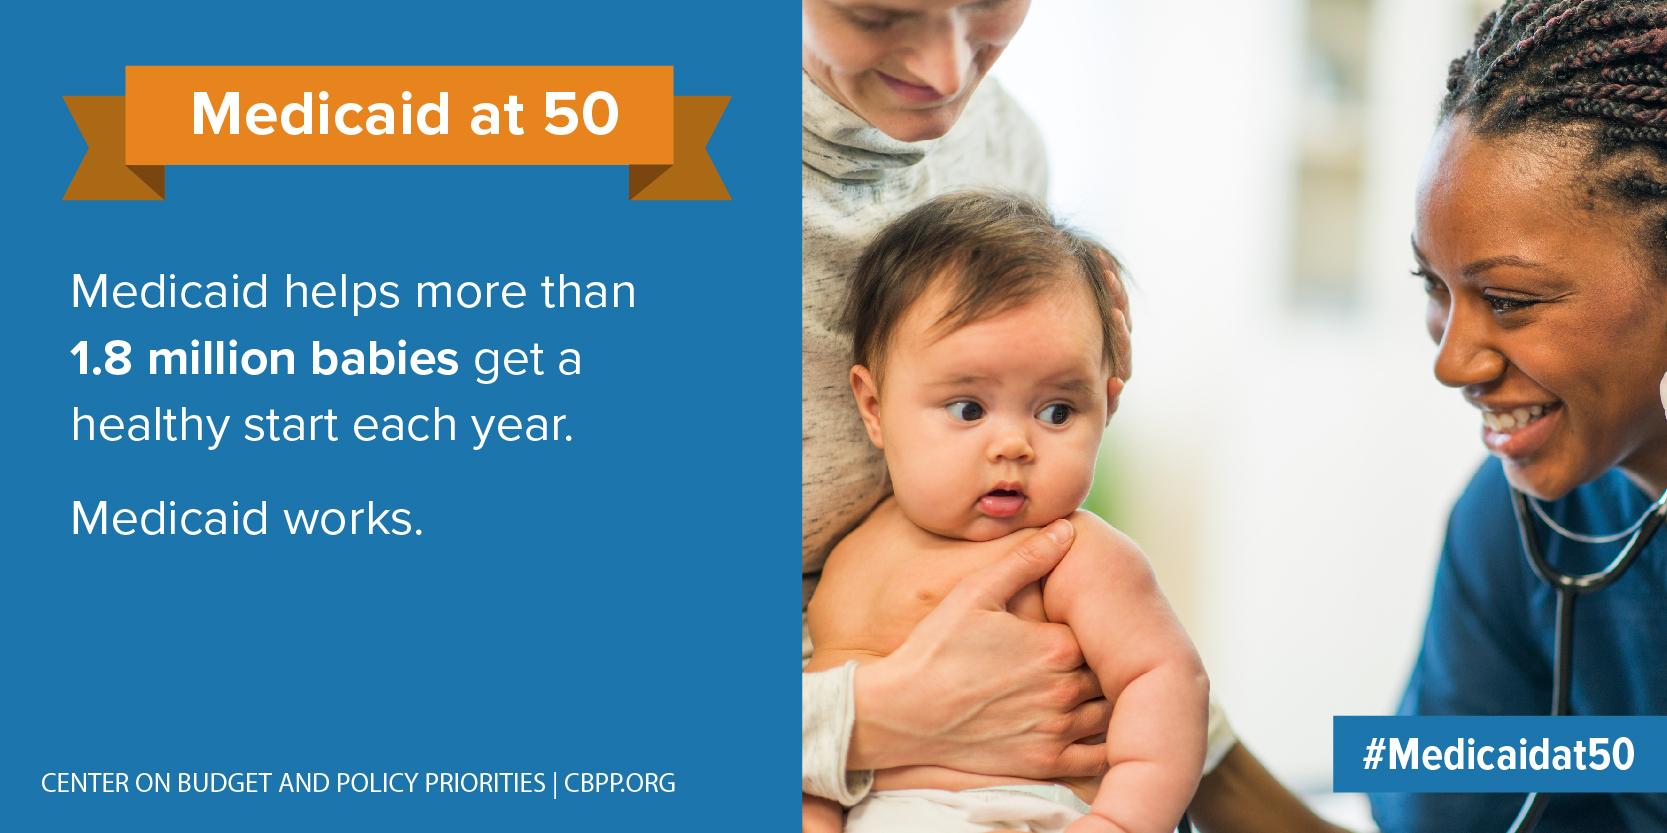 Medicaid at 50: Medicaid helps more than 1.8 million babies...